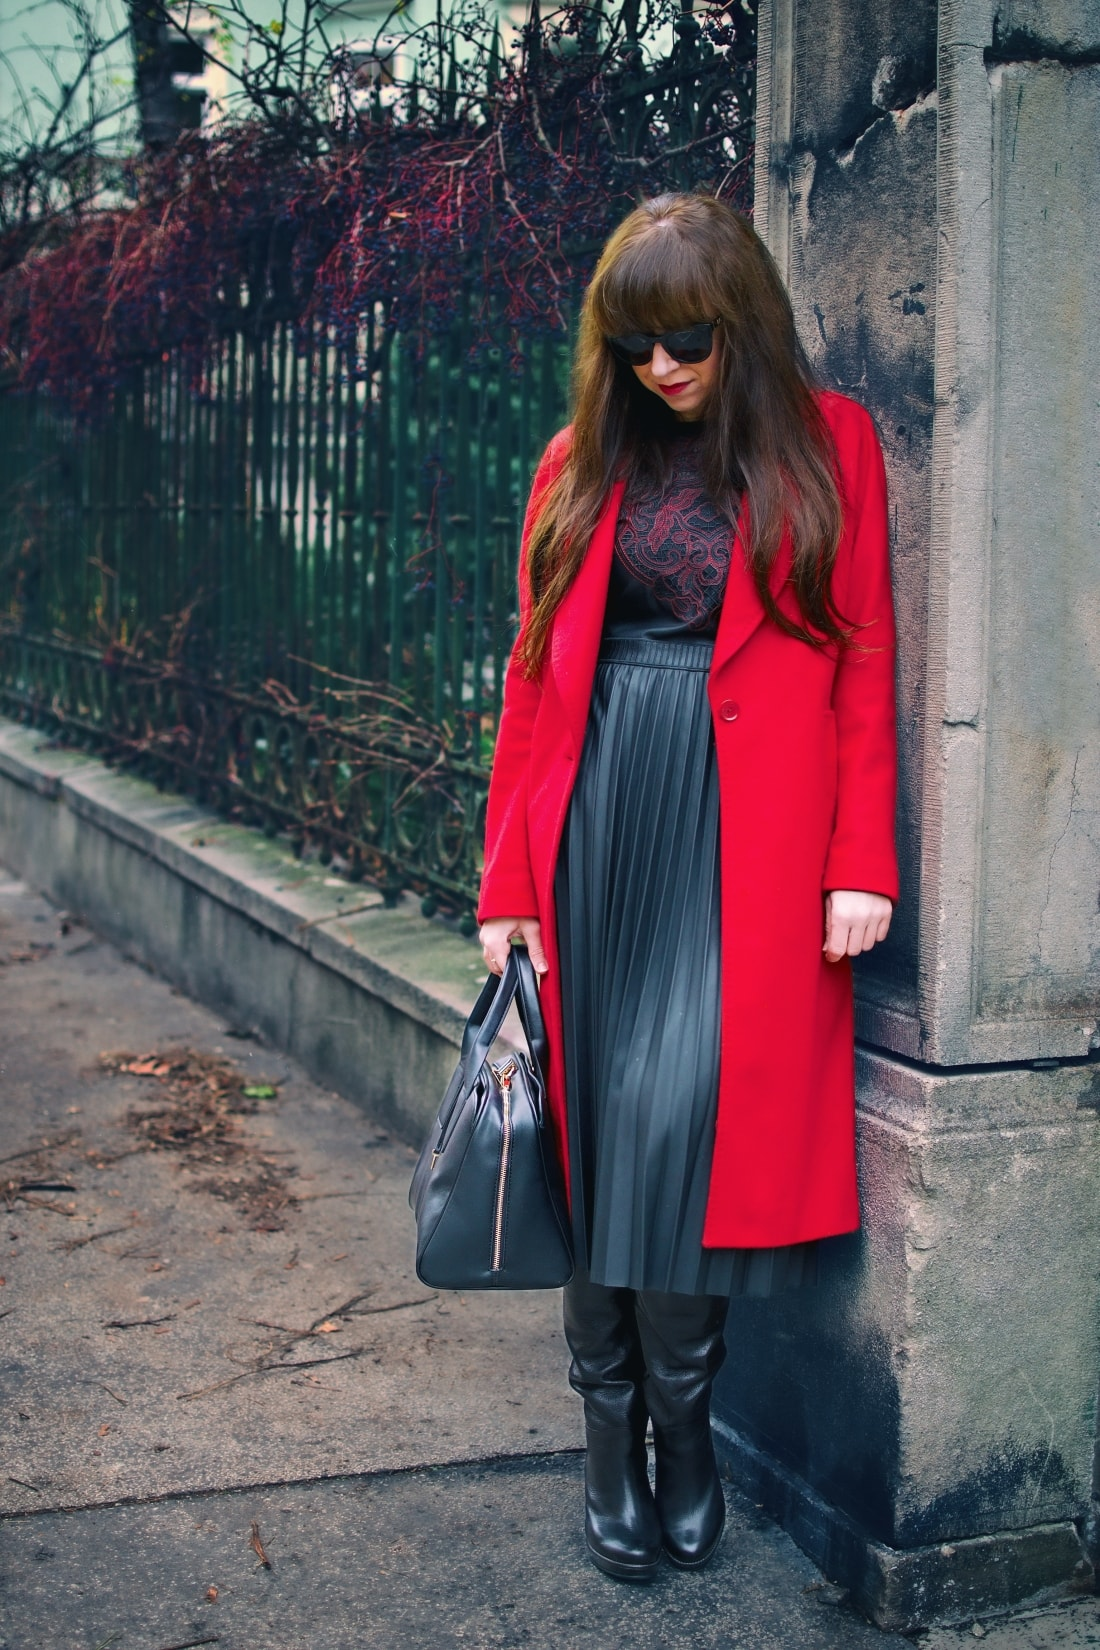 Čierne plisované šaty_Katharine-fashion is beautiful_blog 1_Červený kabát Zara_Kabelka Parfois_Katarína Jakubčová_Fashion blogger